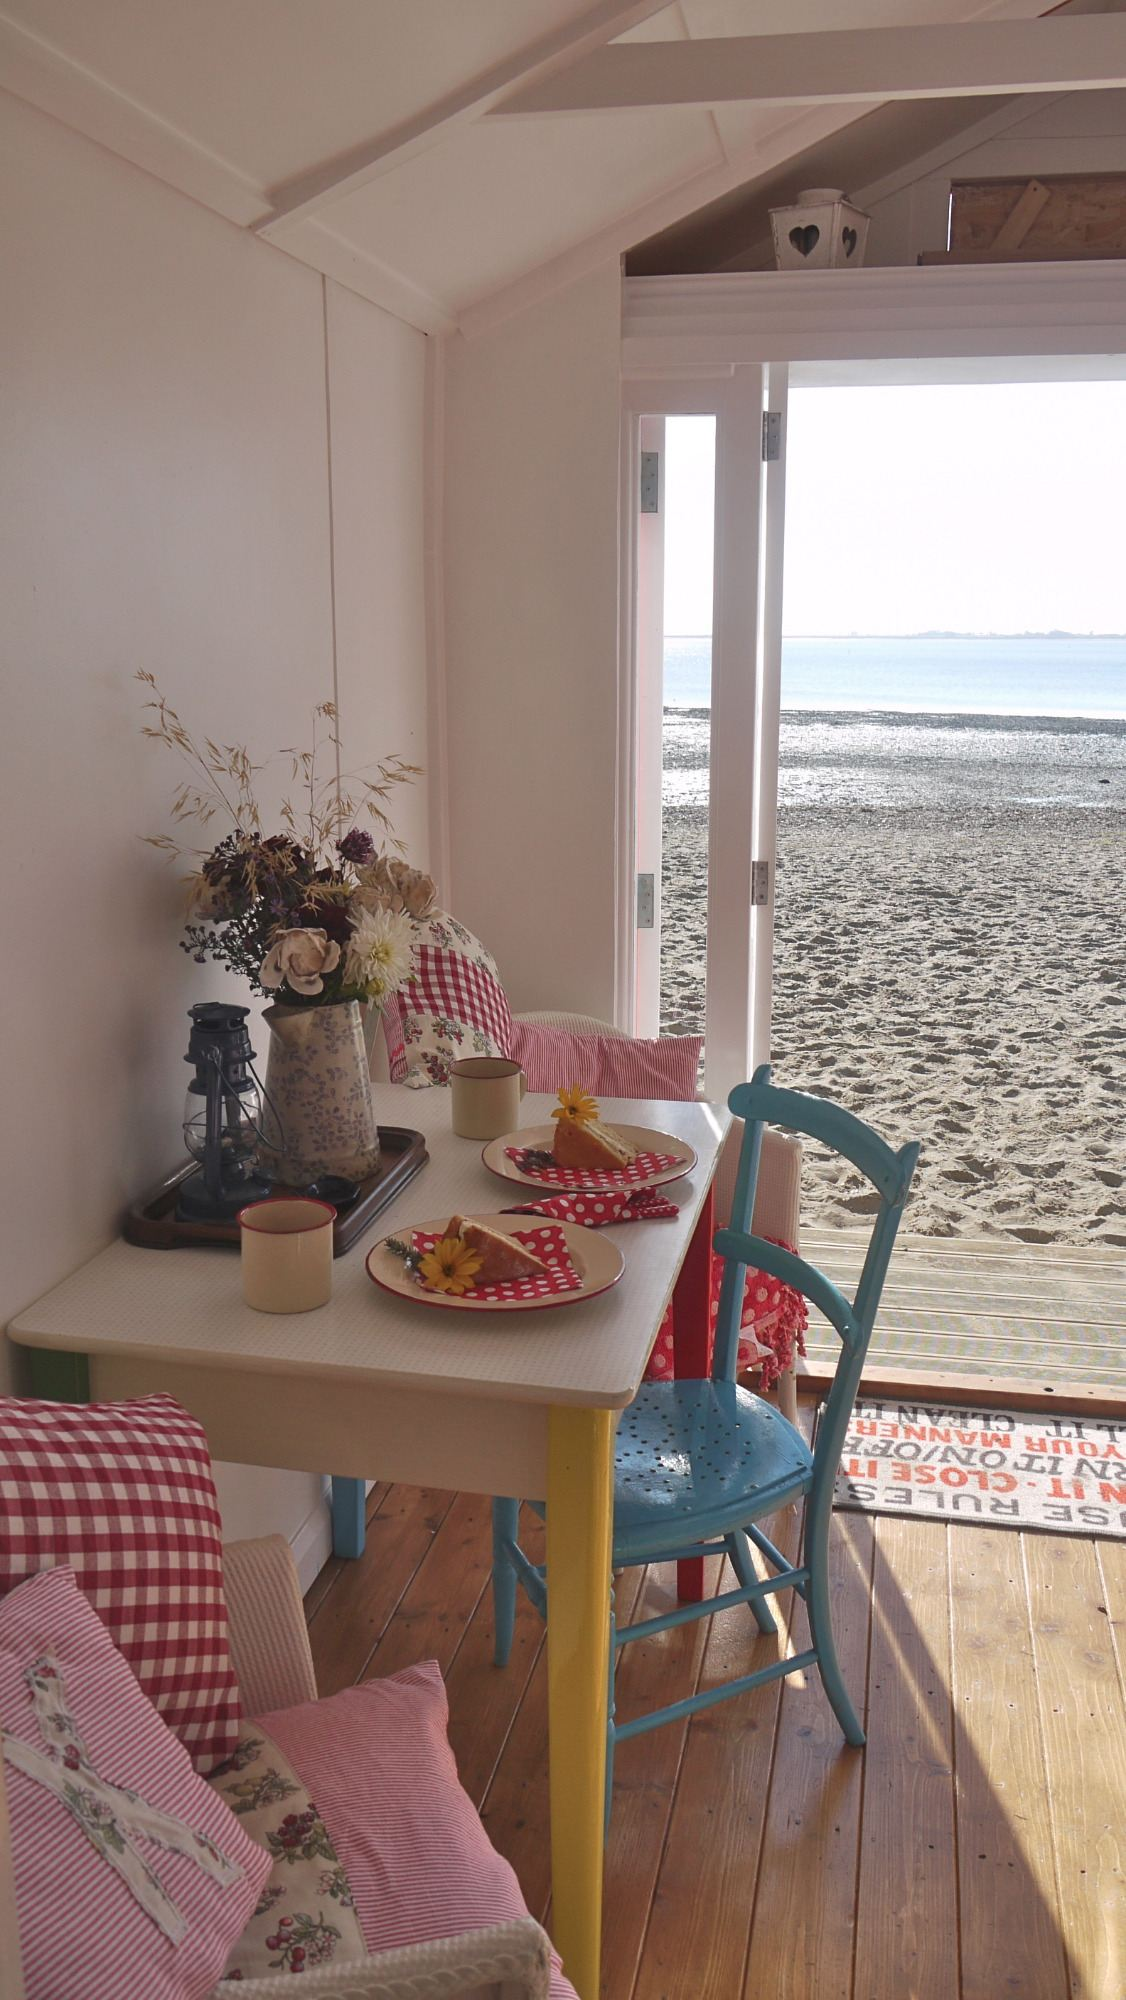 Gallery for Beach hut decoration ideas